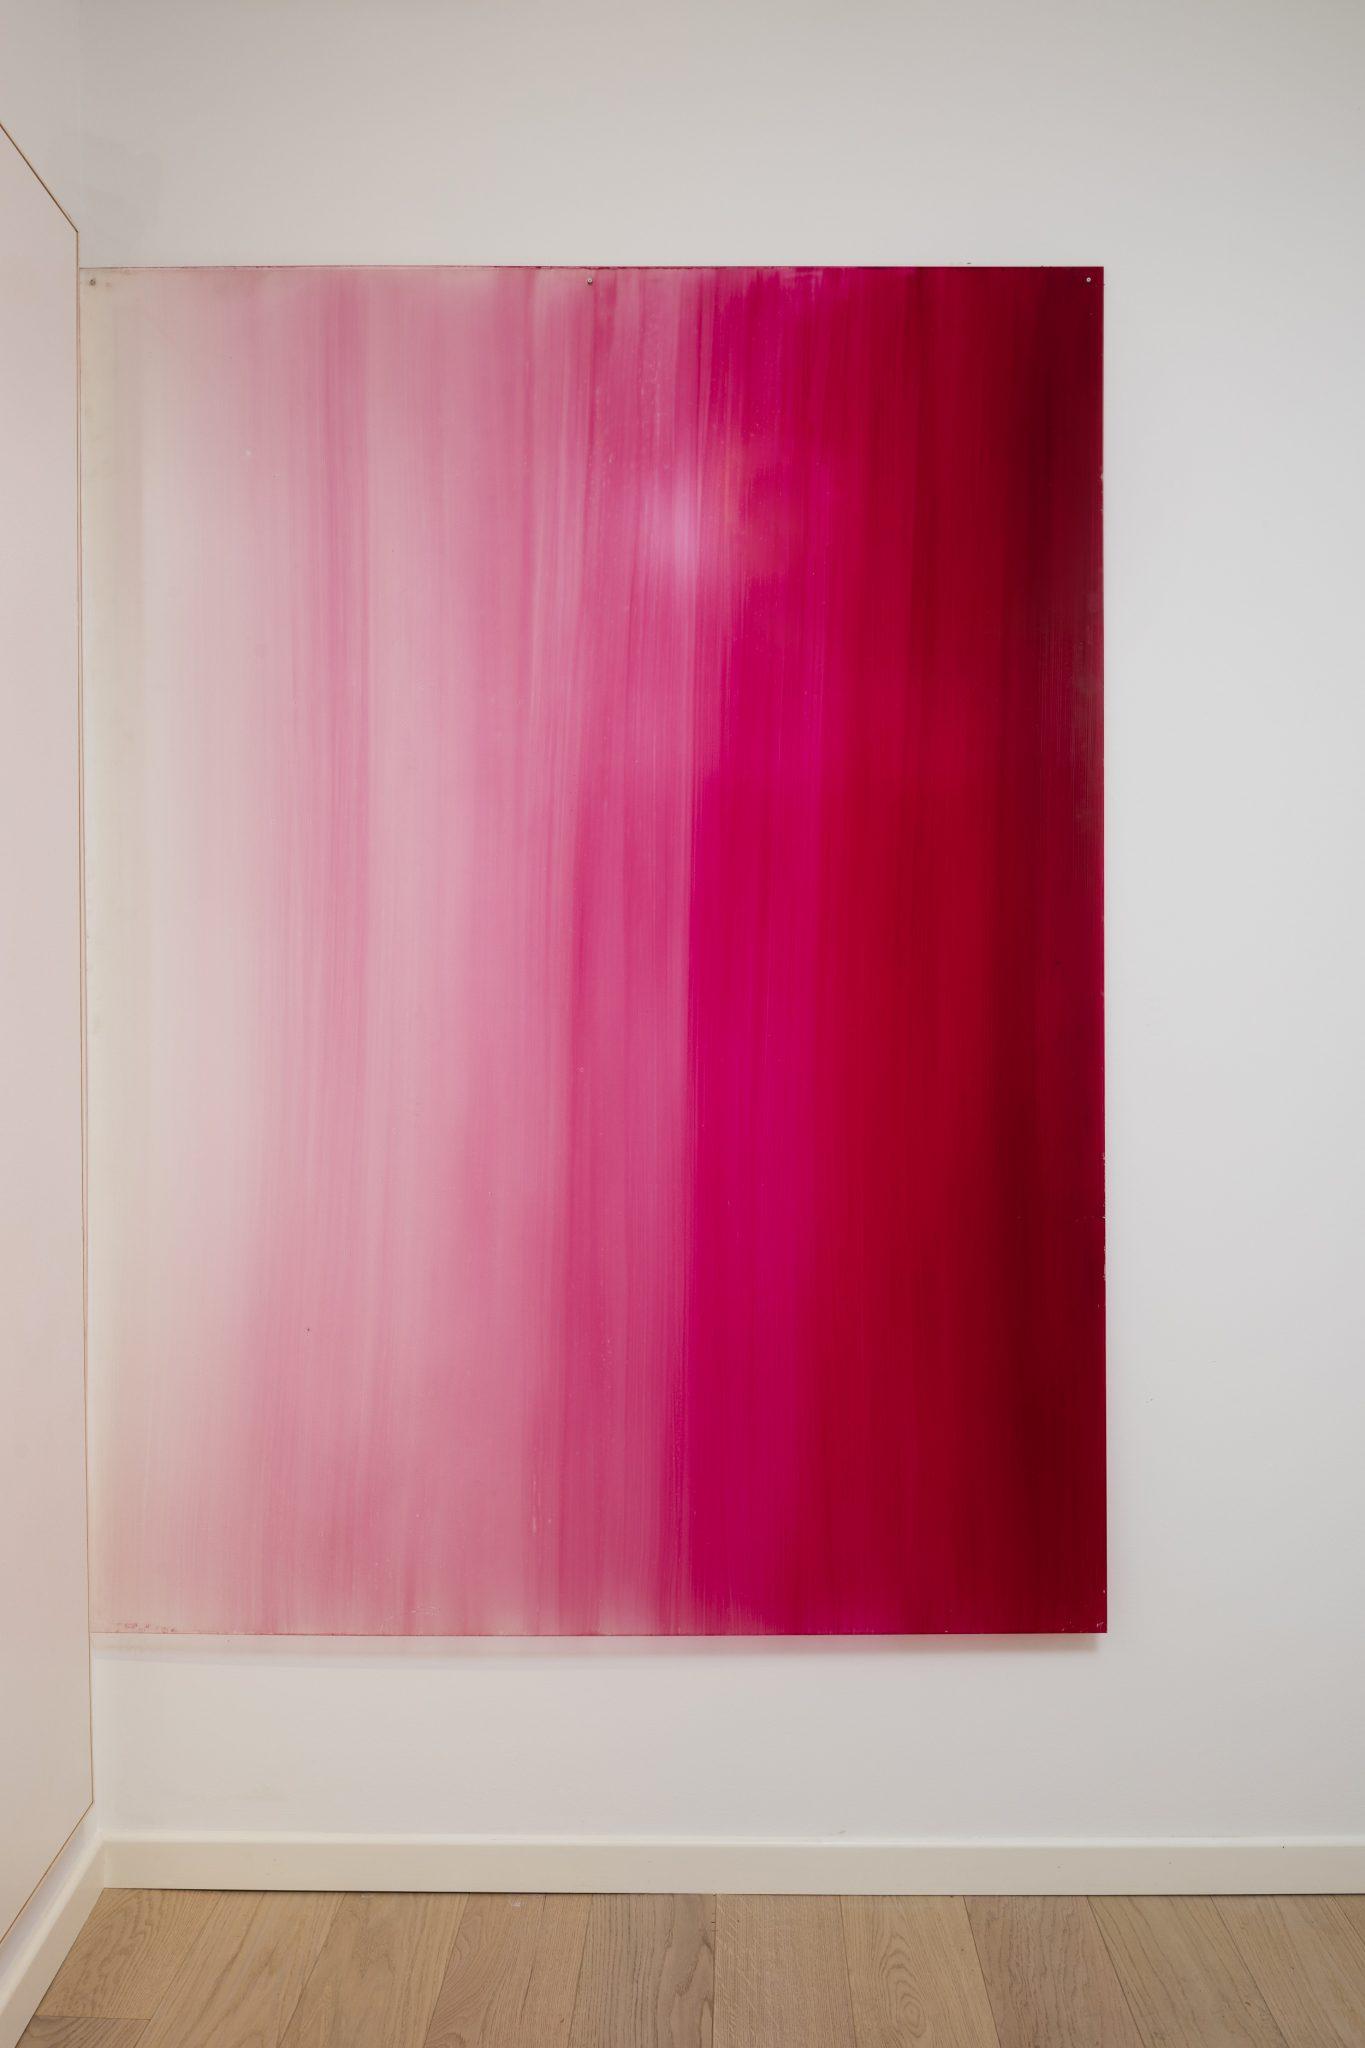 Albert Oehlen – Baum 4, 2016 Fondazione Carriero Milano Fasi Lunari